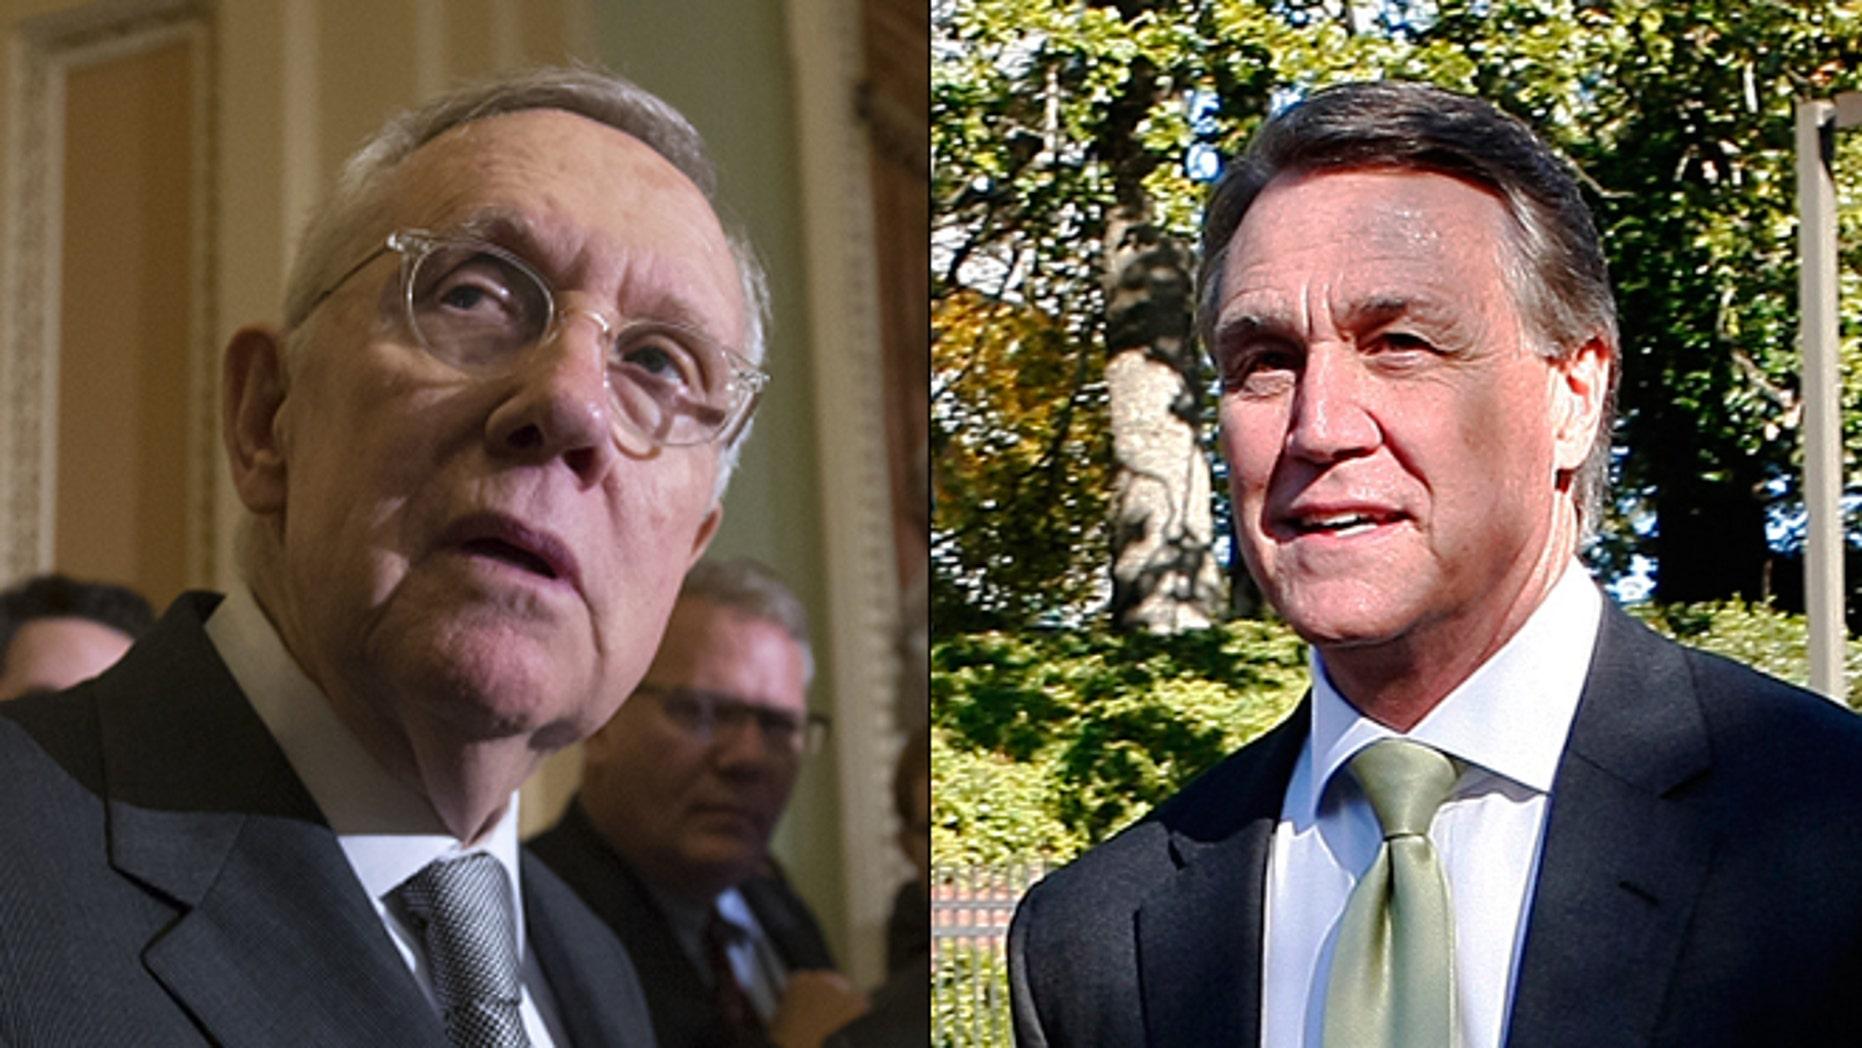 At left, Senate Minority Leader Harry Reid; at right, Sen. David Perdue. (AP/Reuters)